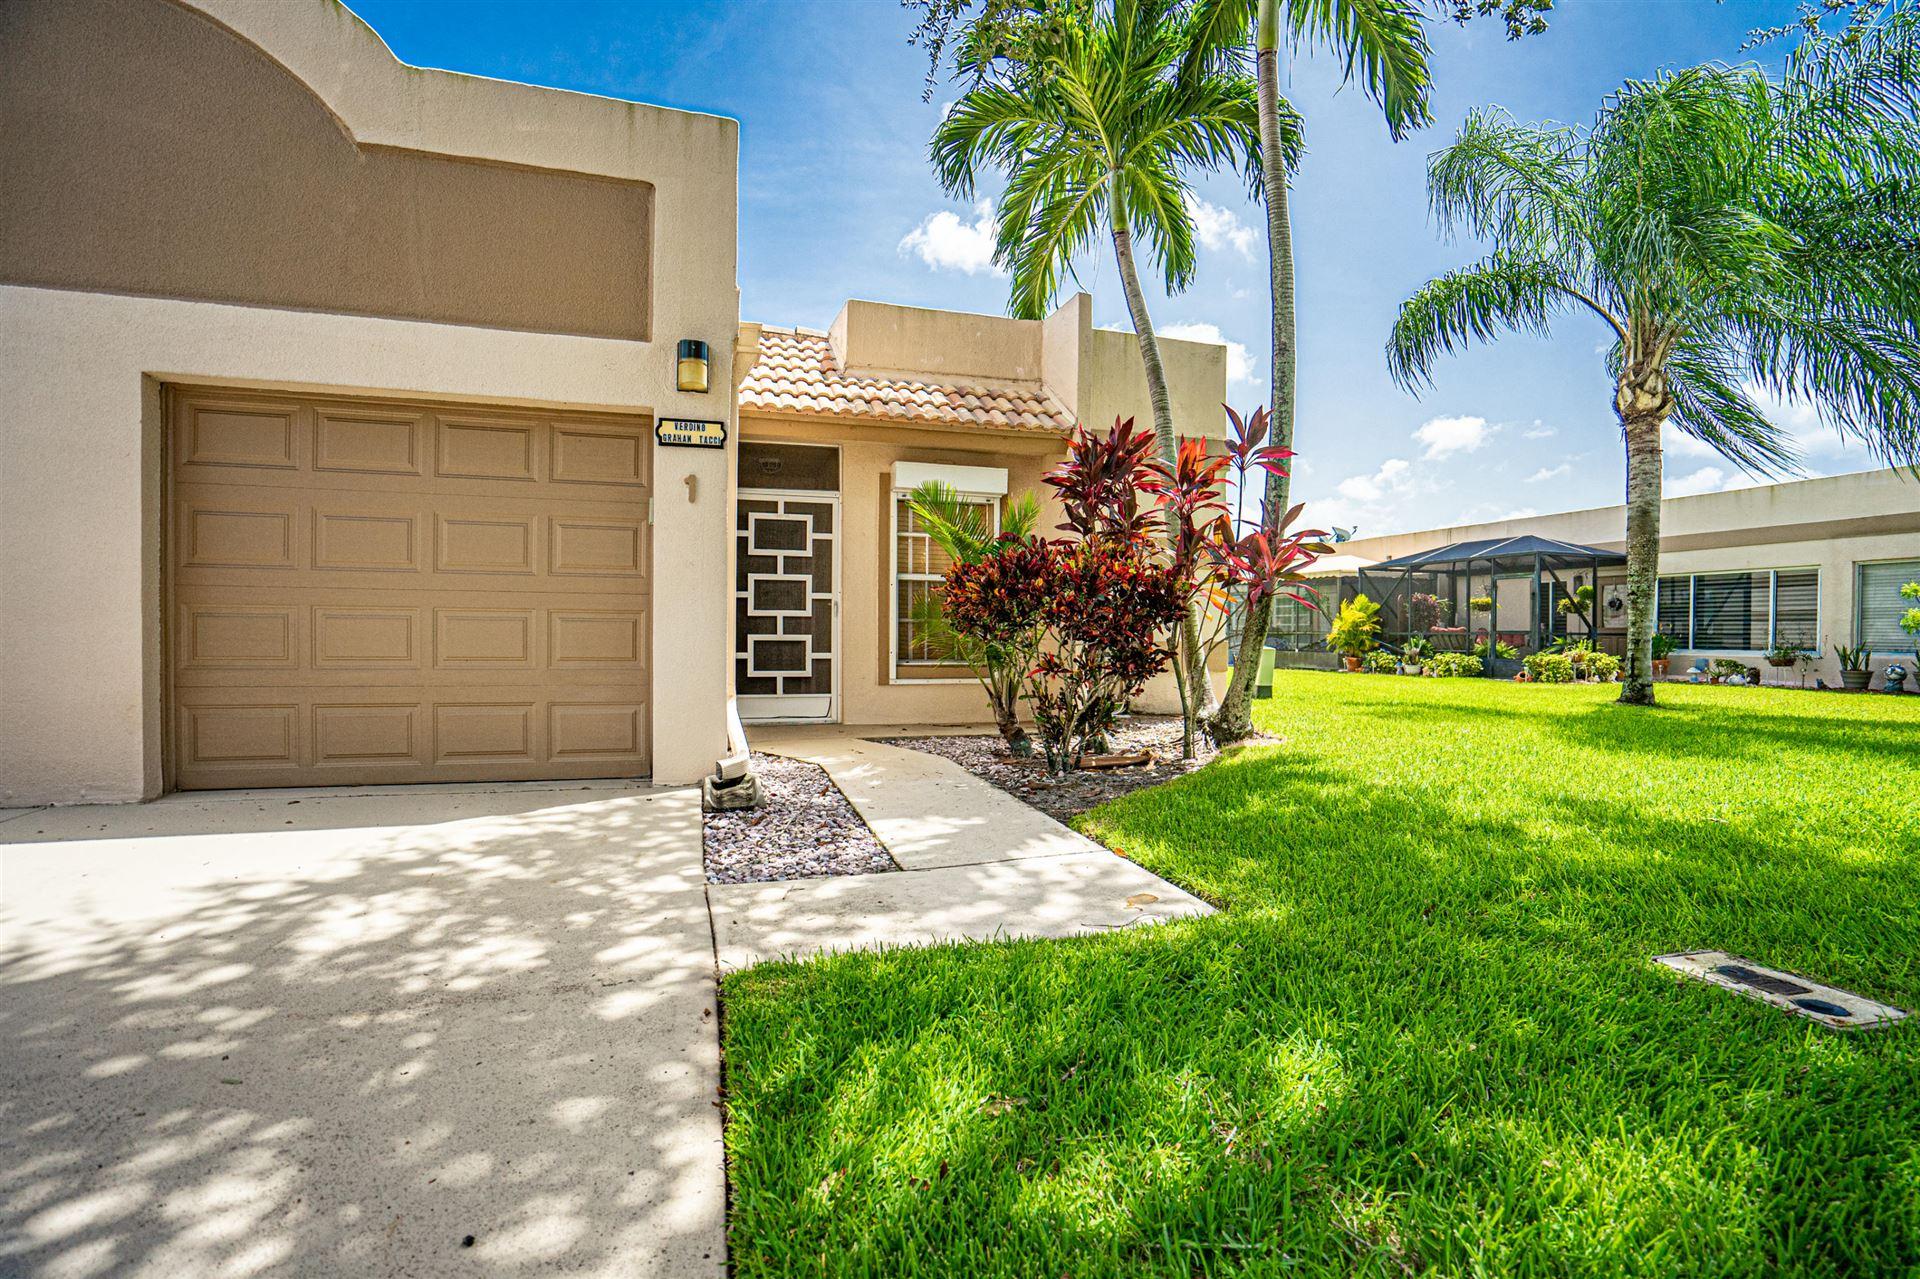 18800 Haywood Terrace #1, Boca Raton, FL 33496 - #: RX-10653117